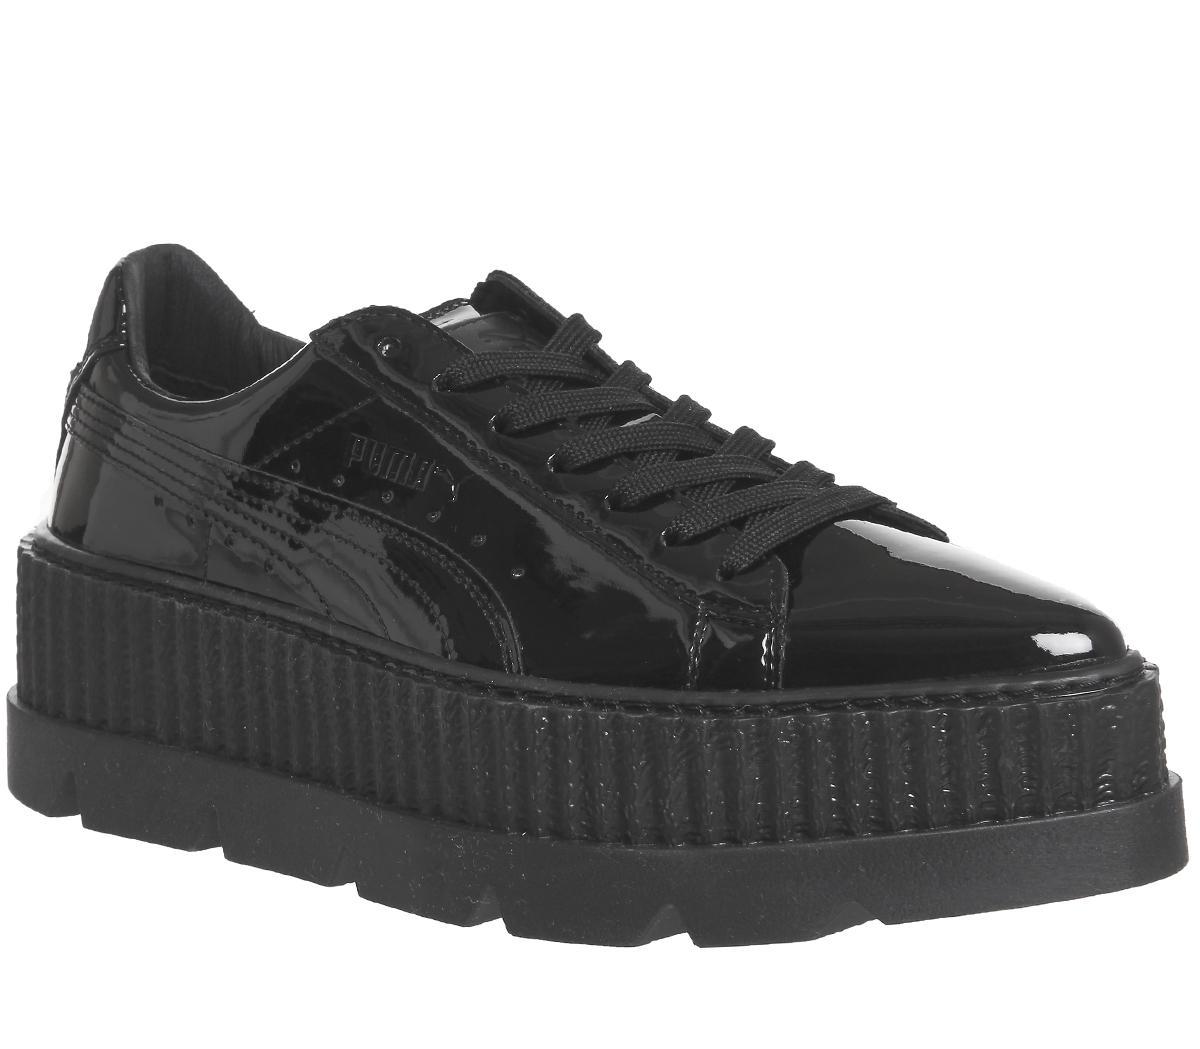 quality design 7411a ac0c6 fenty trainers black